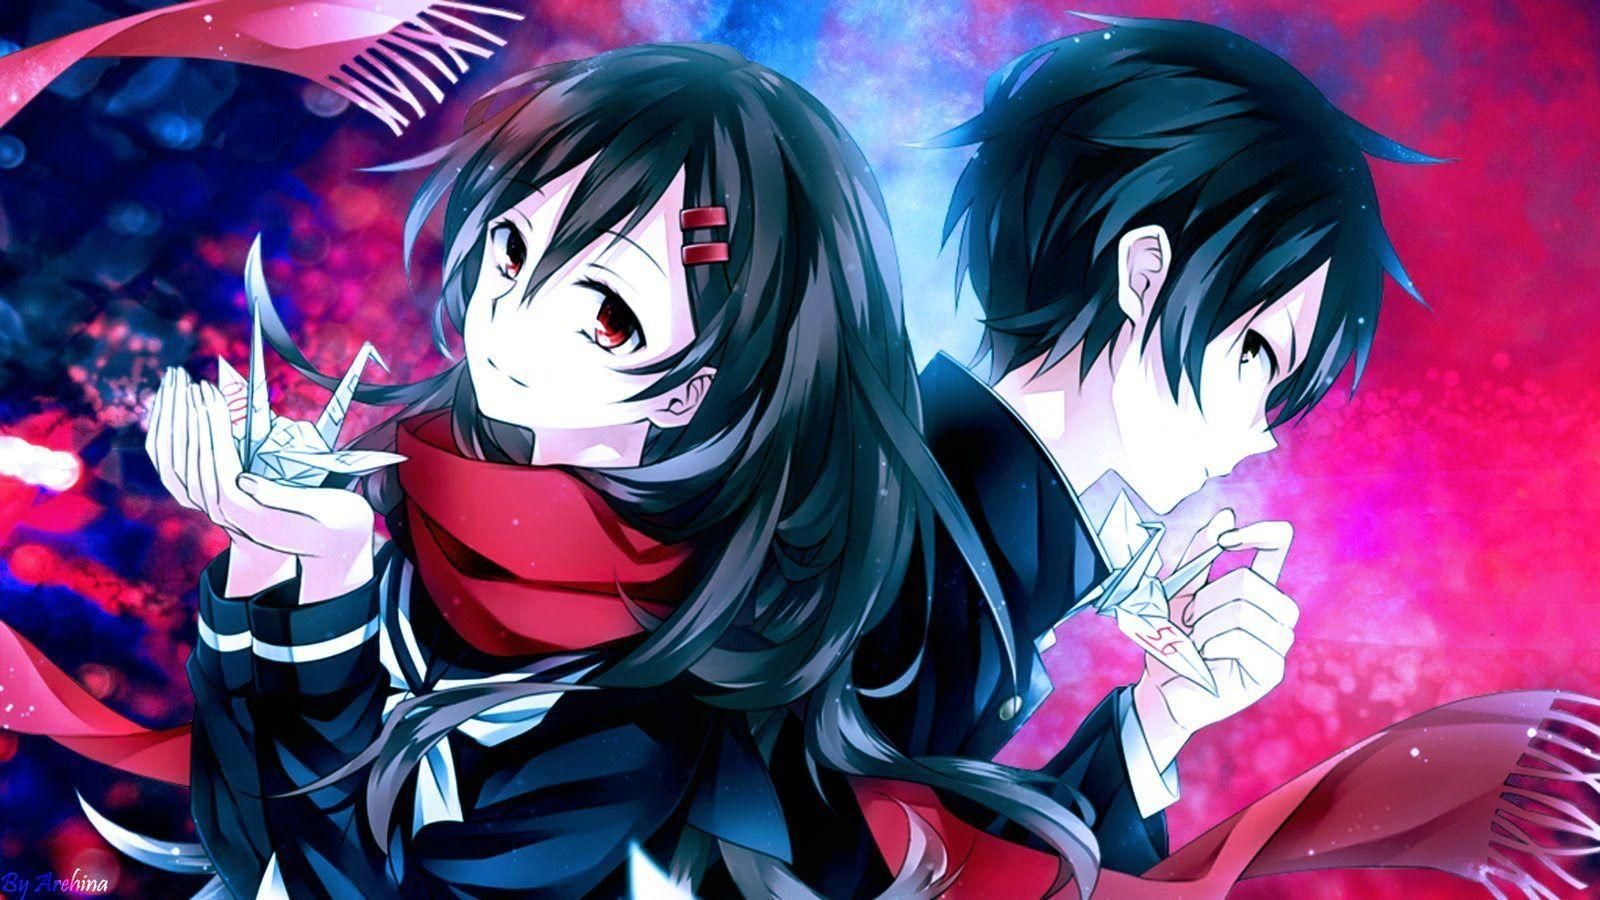 Mekakucity Actors Wallpapers Wallpaper Cave Anime Images Anime Actors